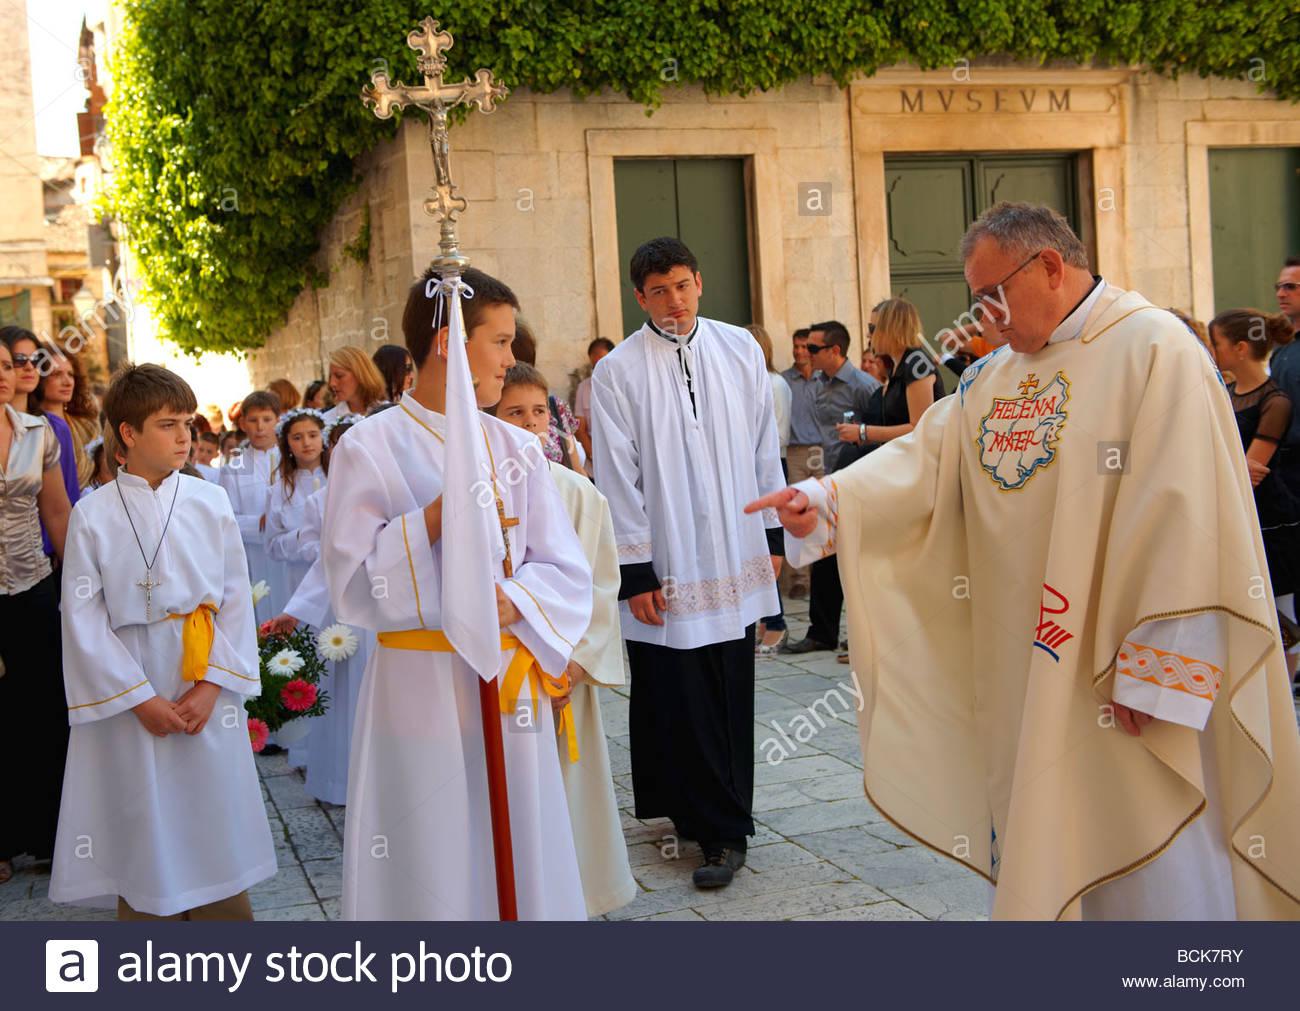 catholic singles in childs Mature catholic singles: 50+ years old 286 me gusta 1 personas están hablando de esto for mature catholic singles seeking friendship, fellowship.